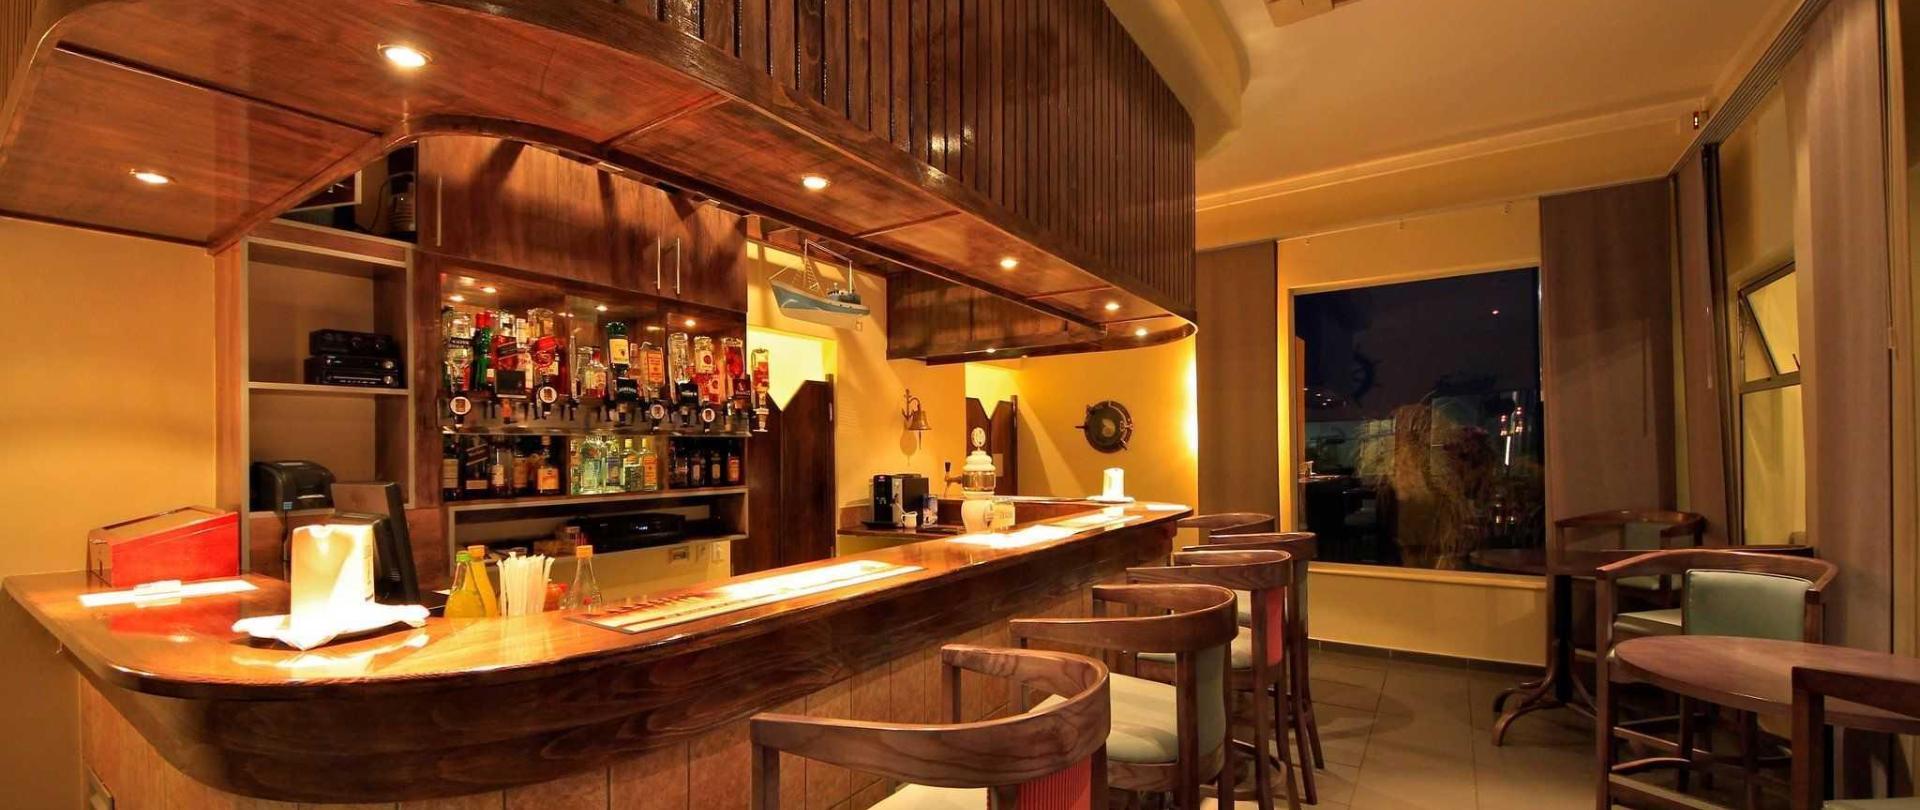 nest-hotel-crayfish-bar-2016.jpg